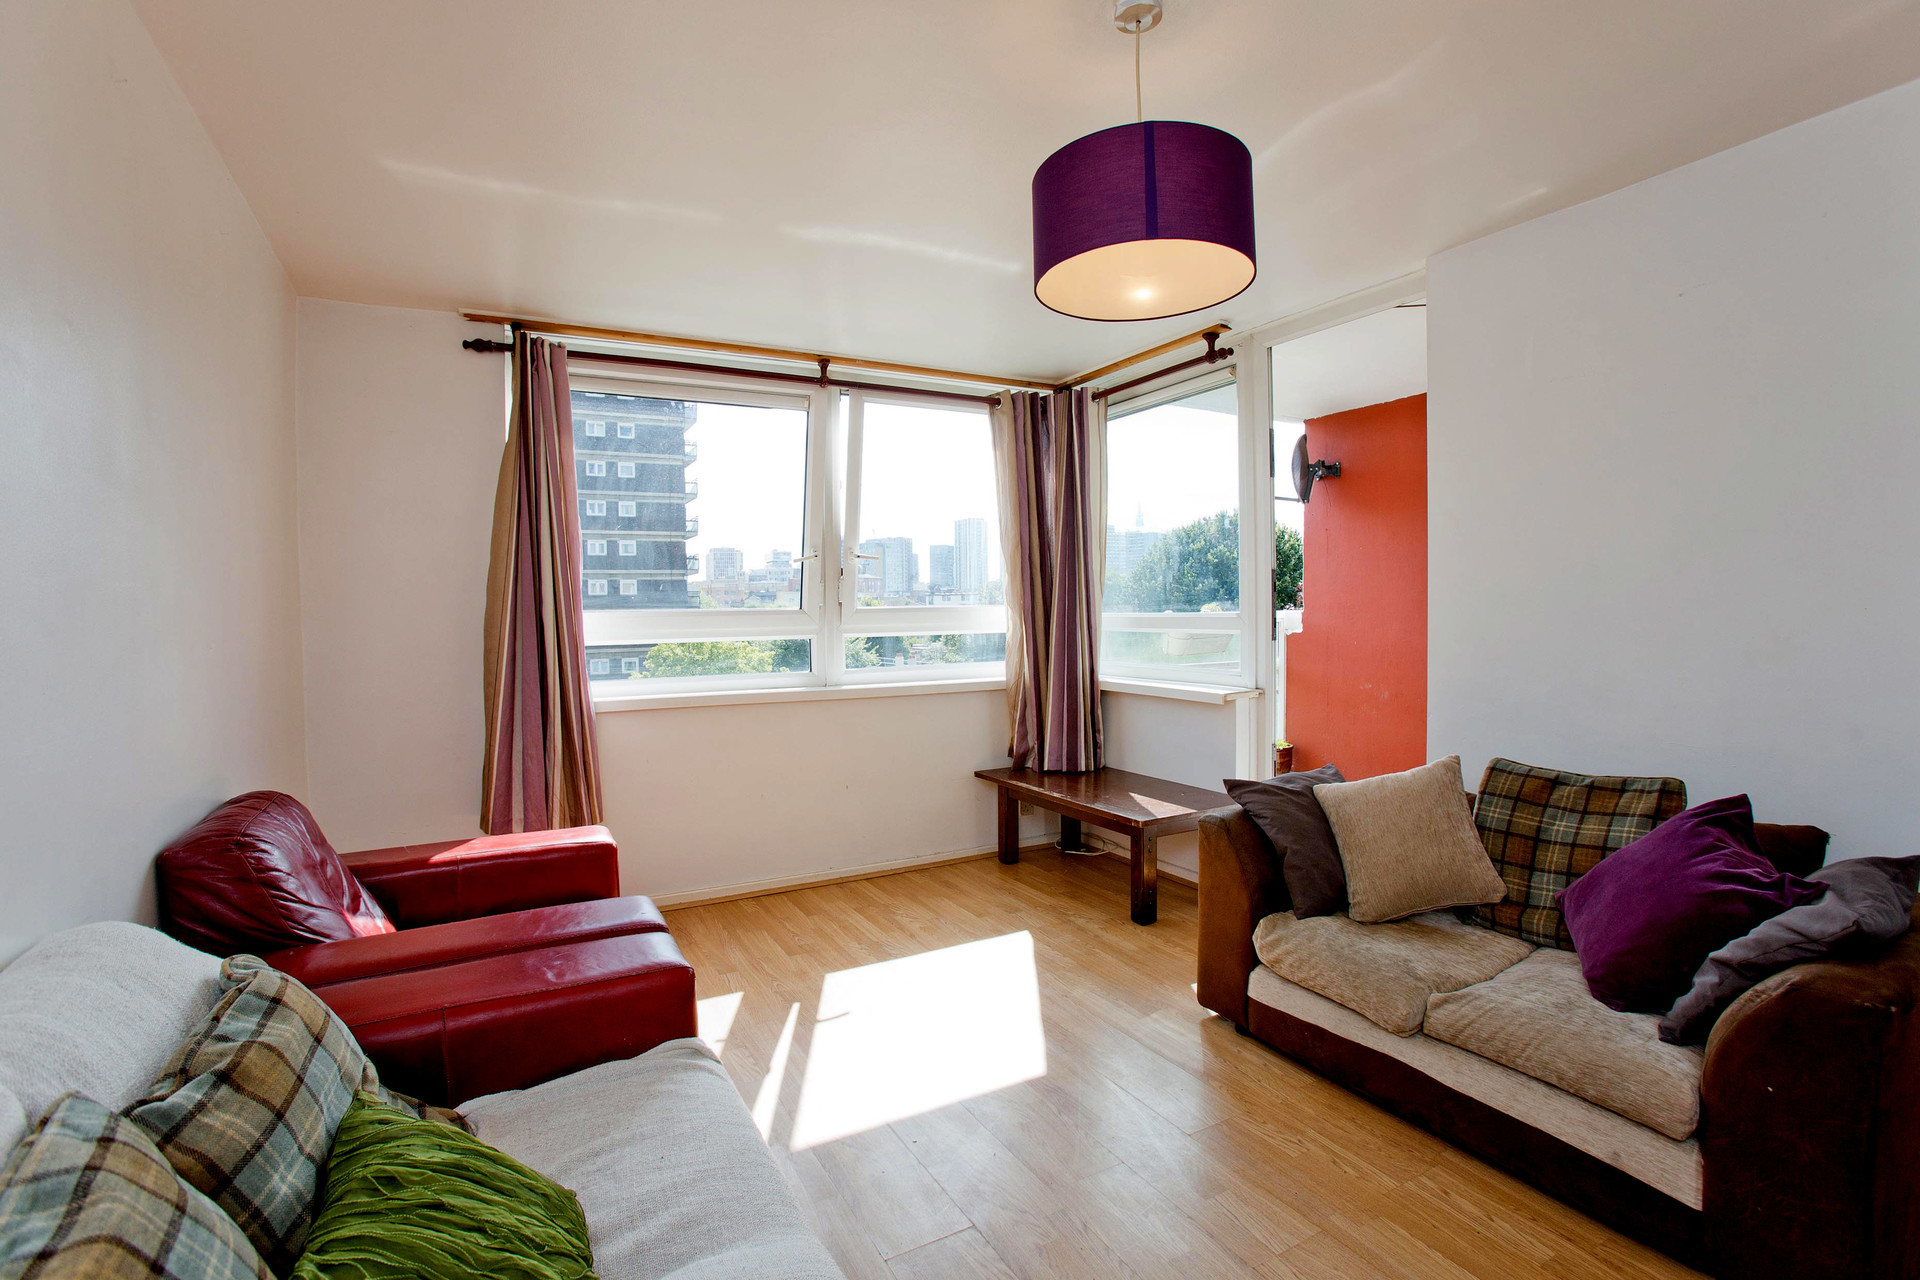 3 bedroom flat for rent zone 1 near city flat rent london